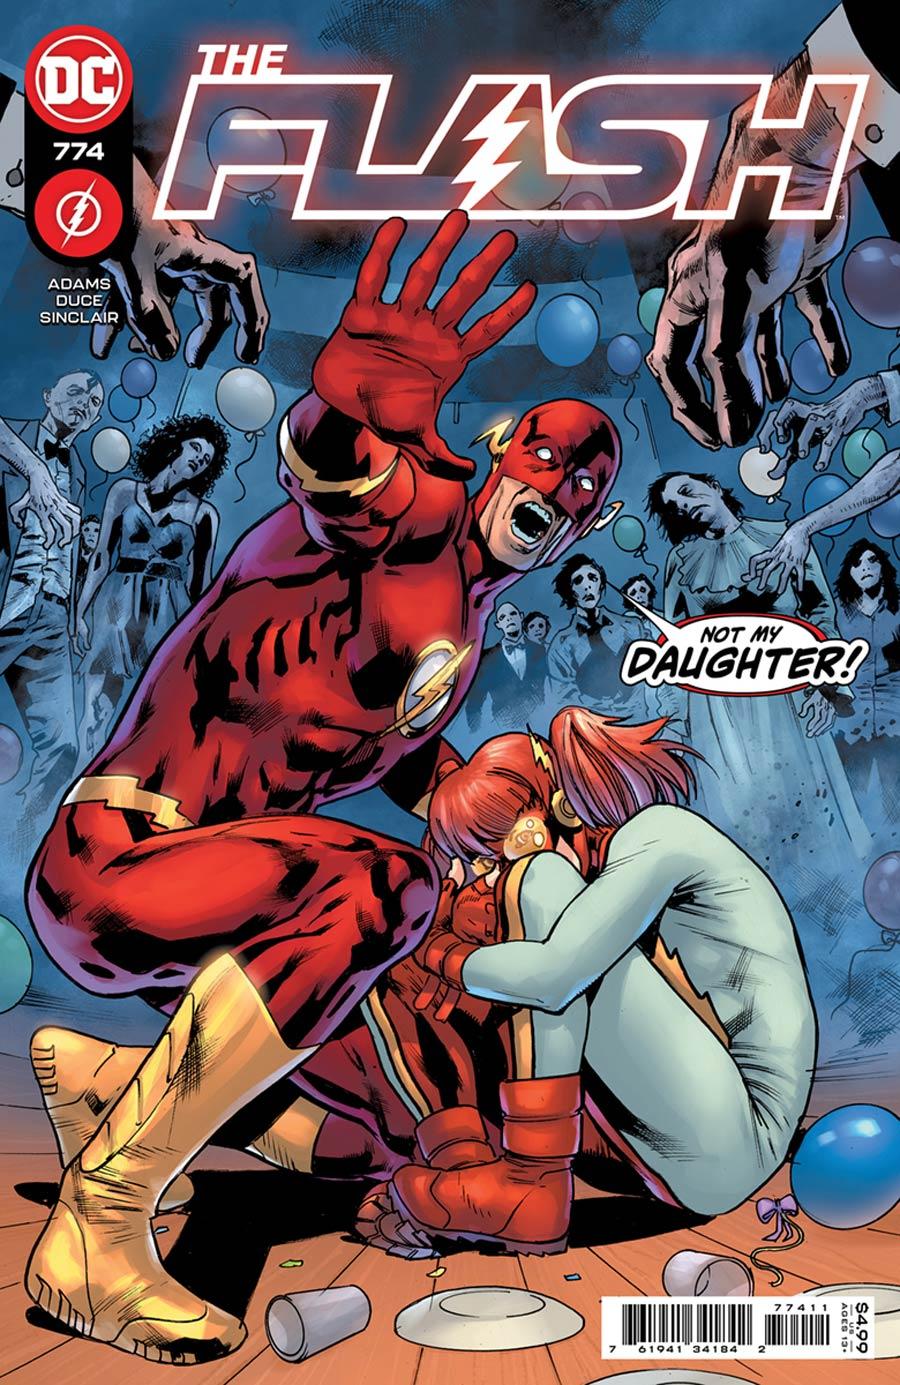 Flash Vol 5 #774 Cover A Regular Bryan Hitch Cover